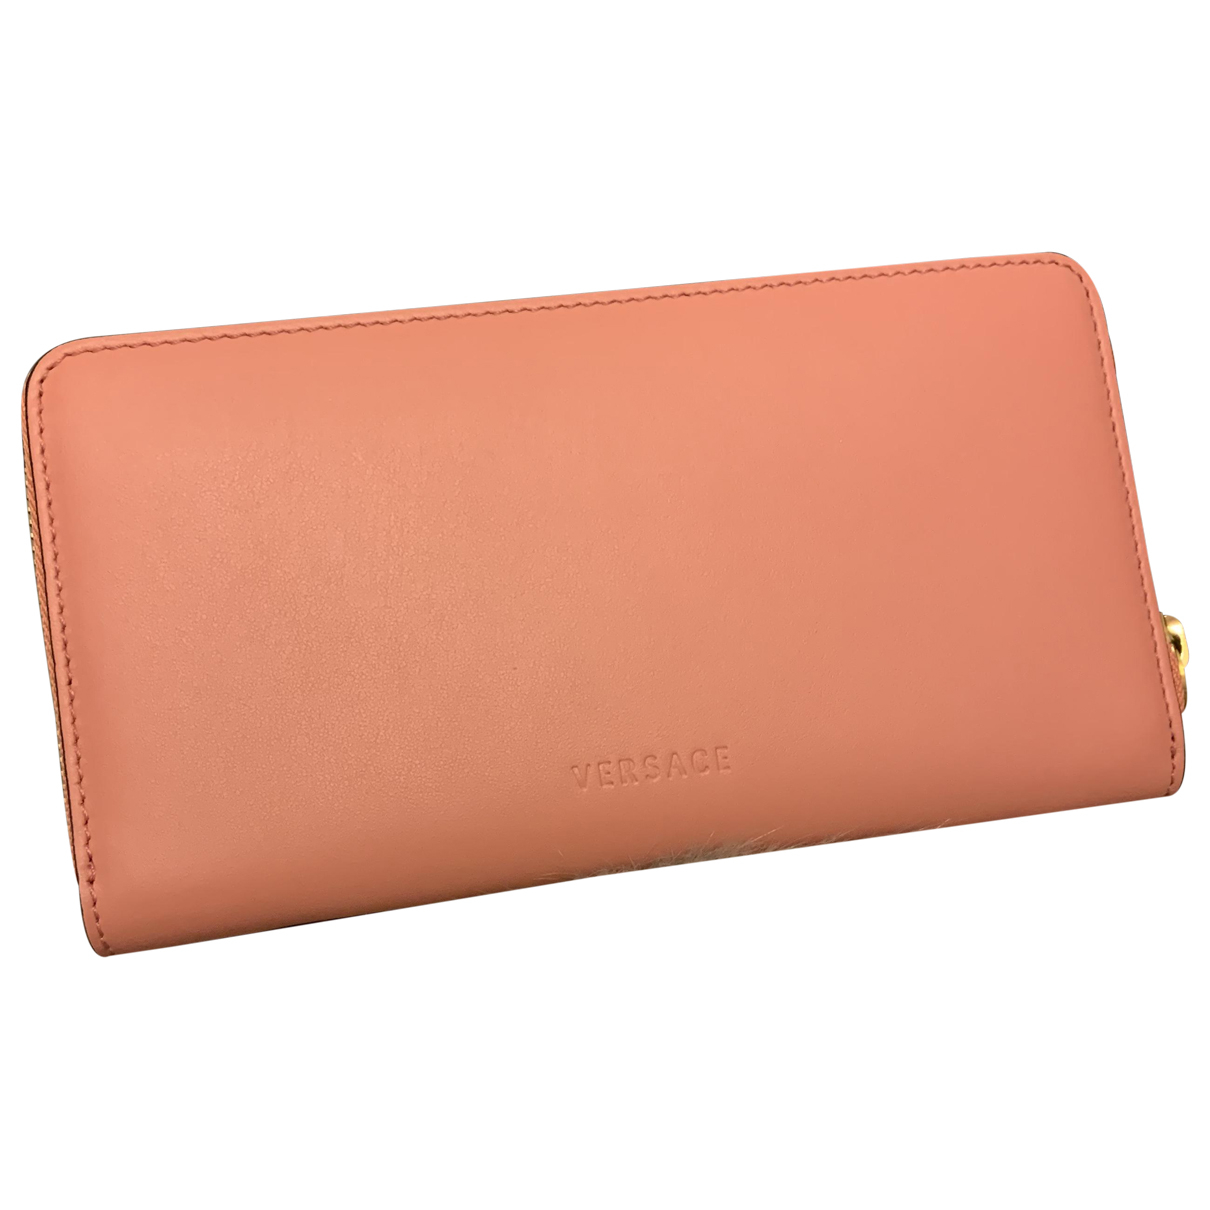 Versace N Pink Leather wallet for Women N